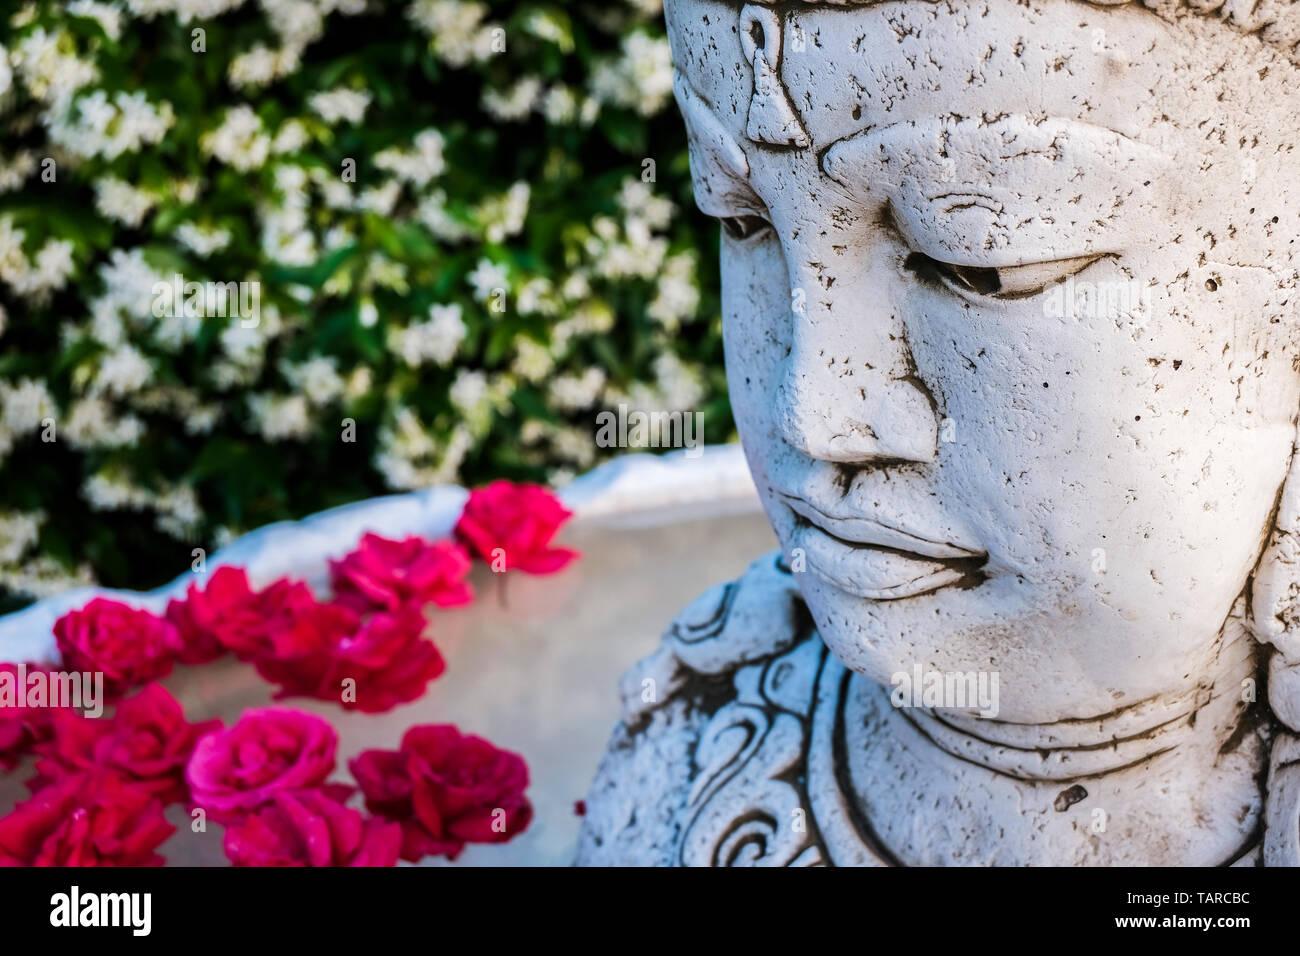 Brahma statue in a garden. - Stock Image